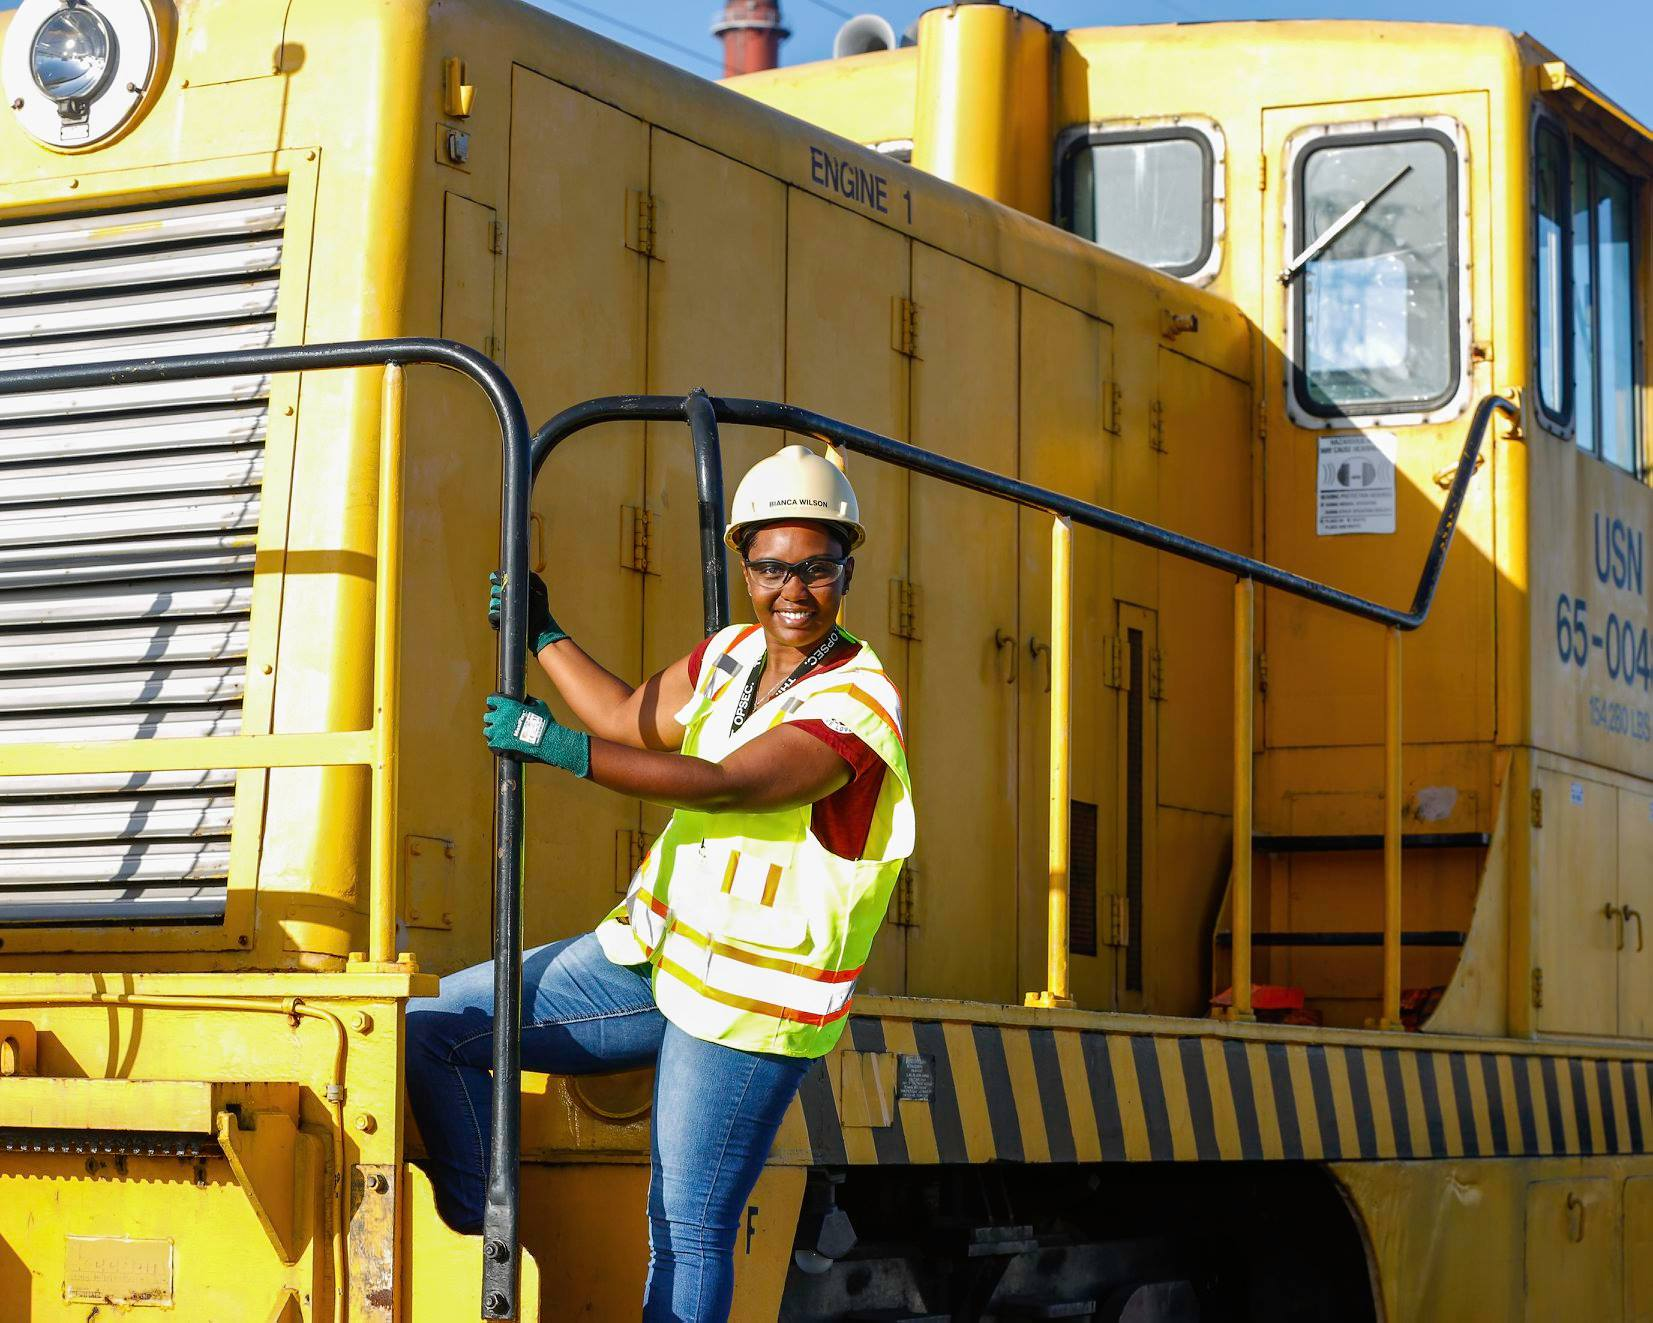 NNSY_railroad_conductor_BiancaWilson.jpg